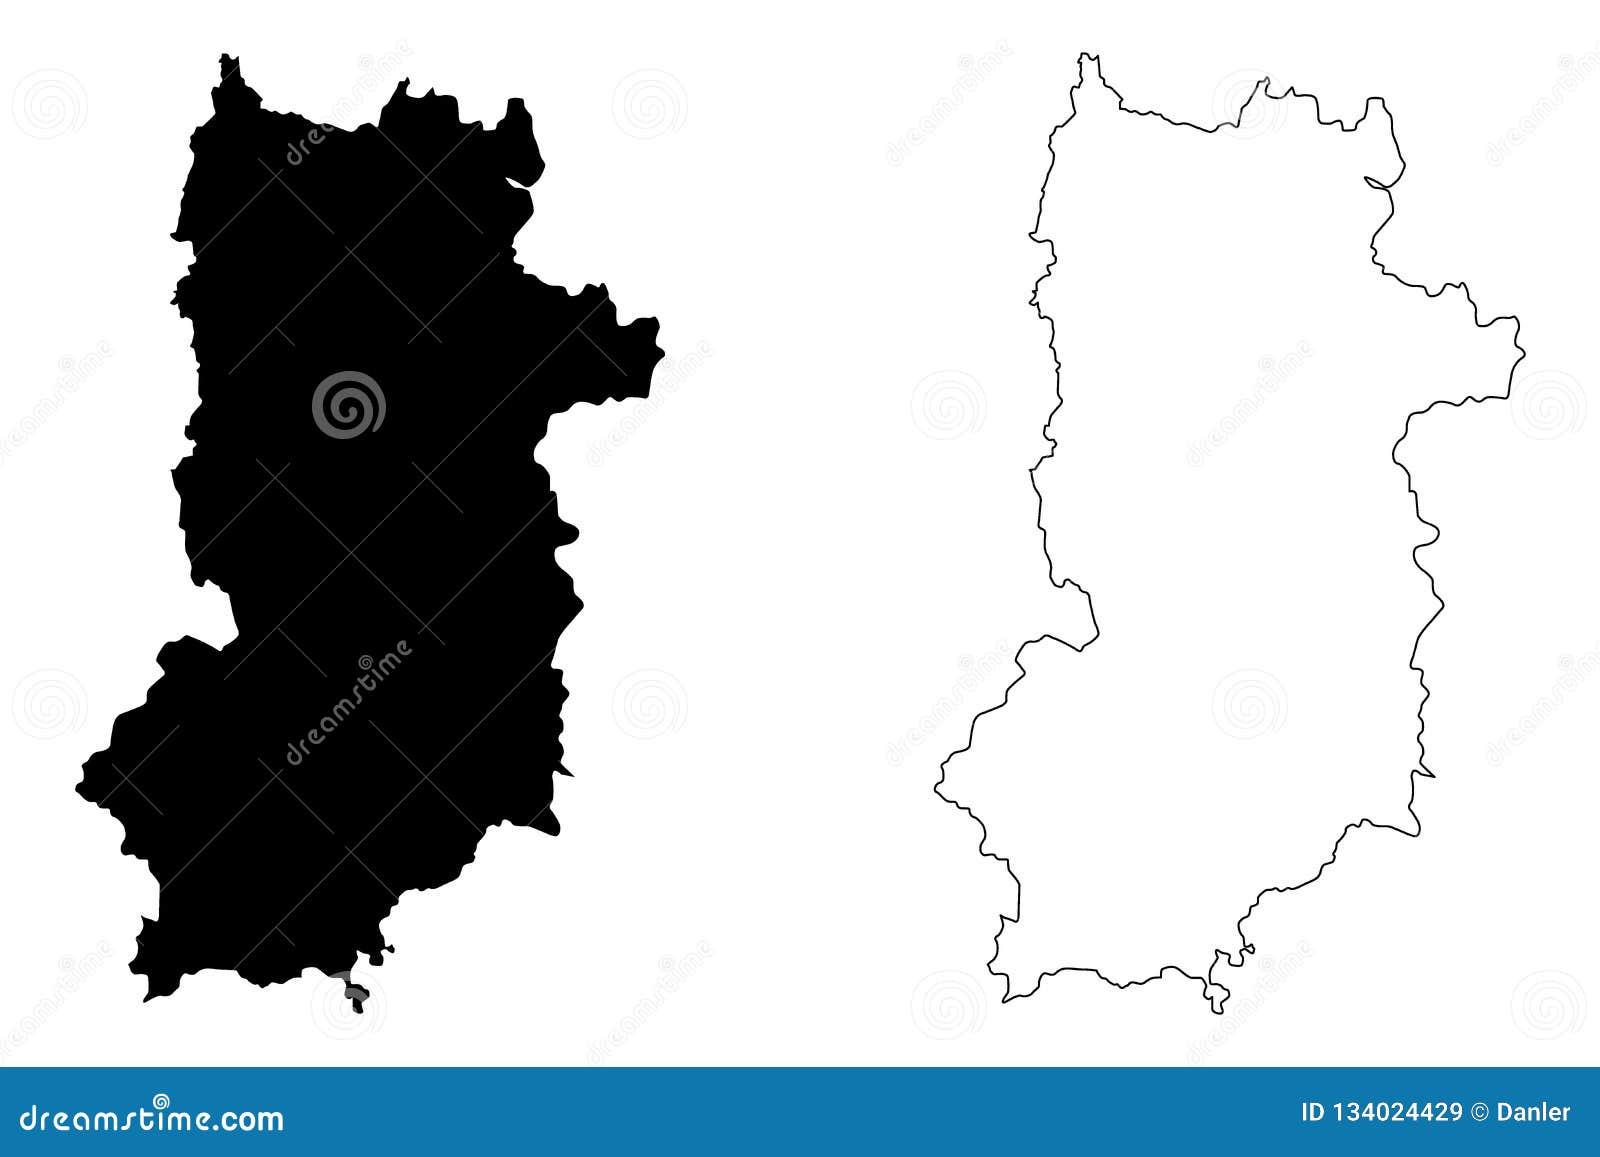 Nara Prefecture Map Vector Stock Vector Illustration Of Archipelago